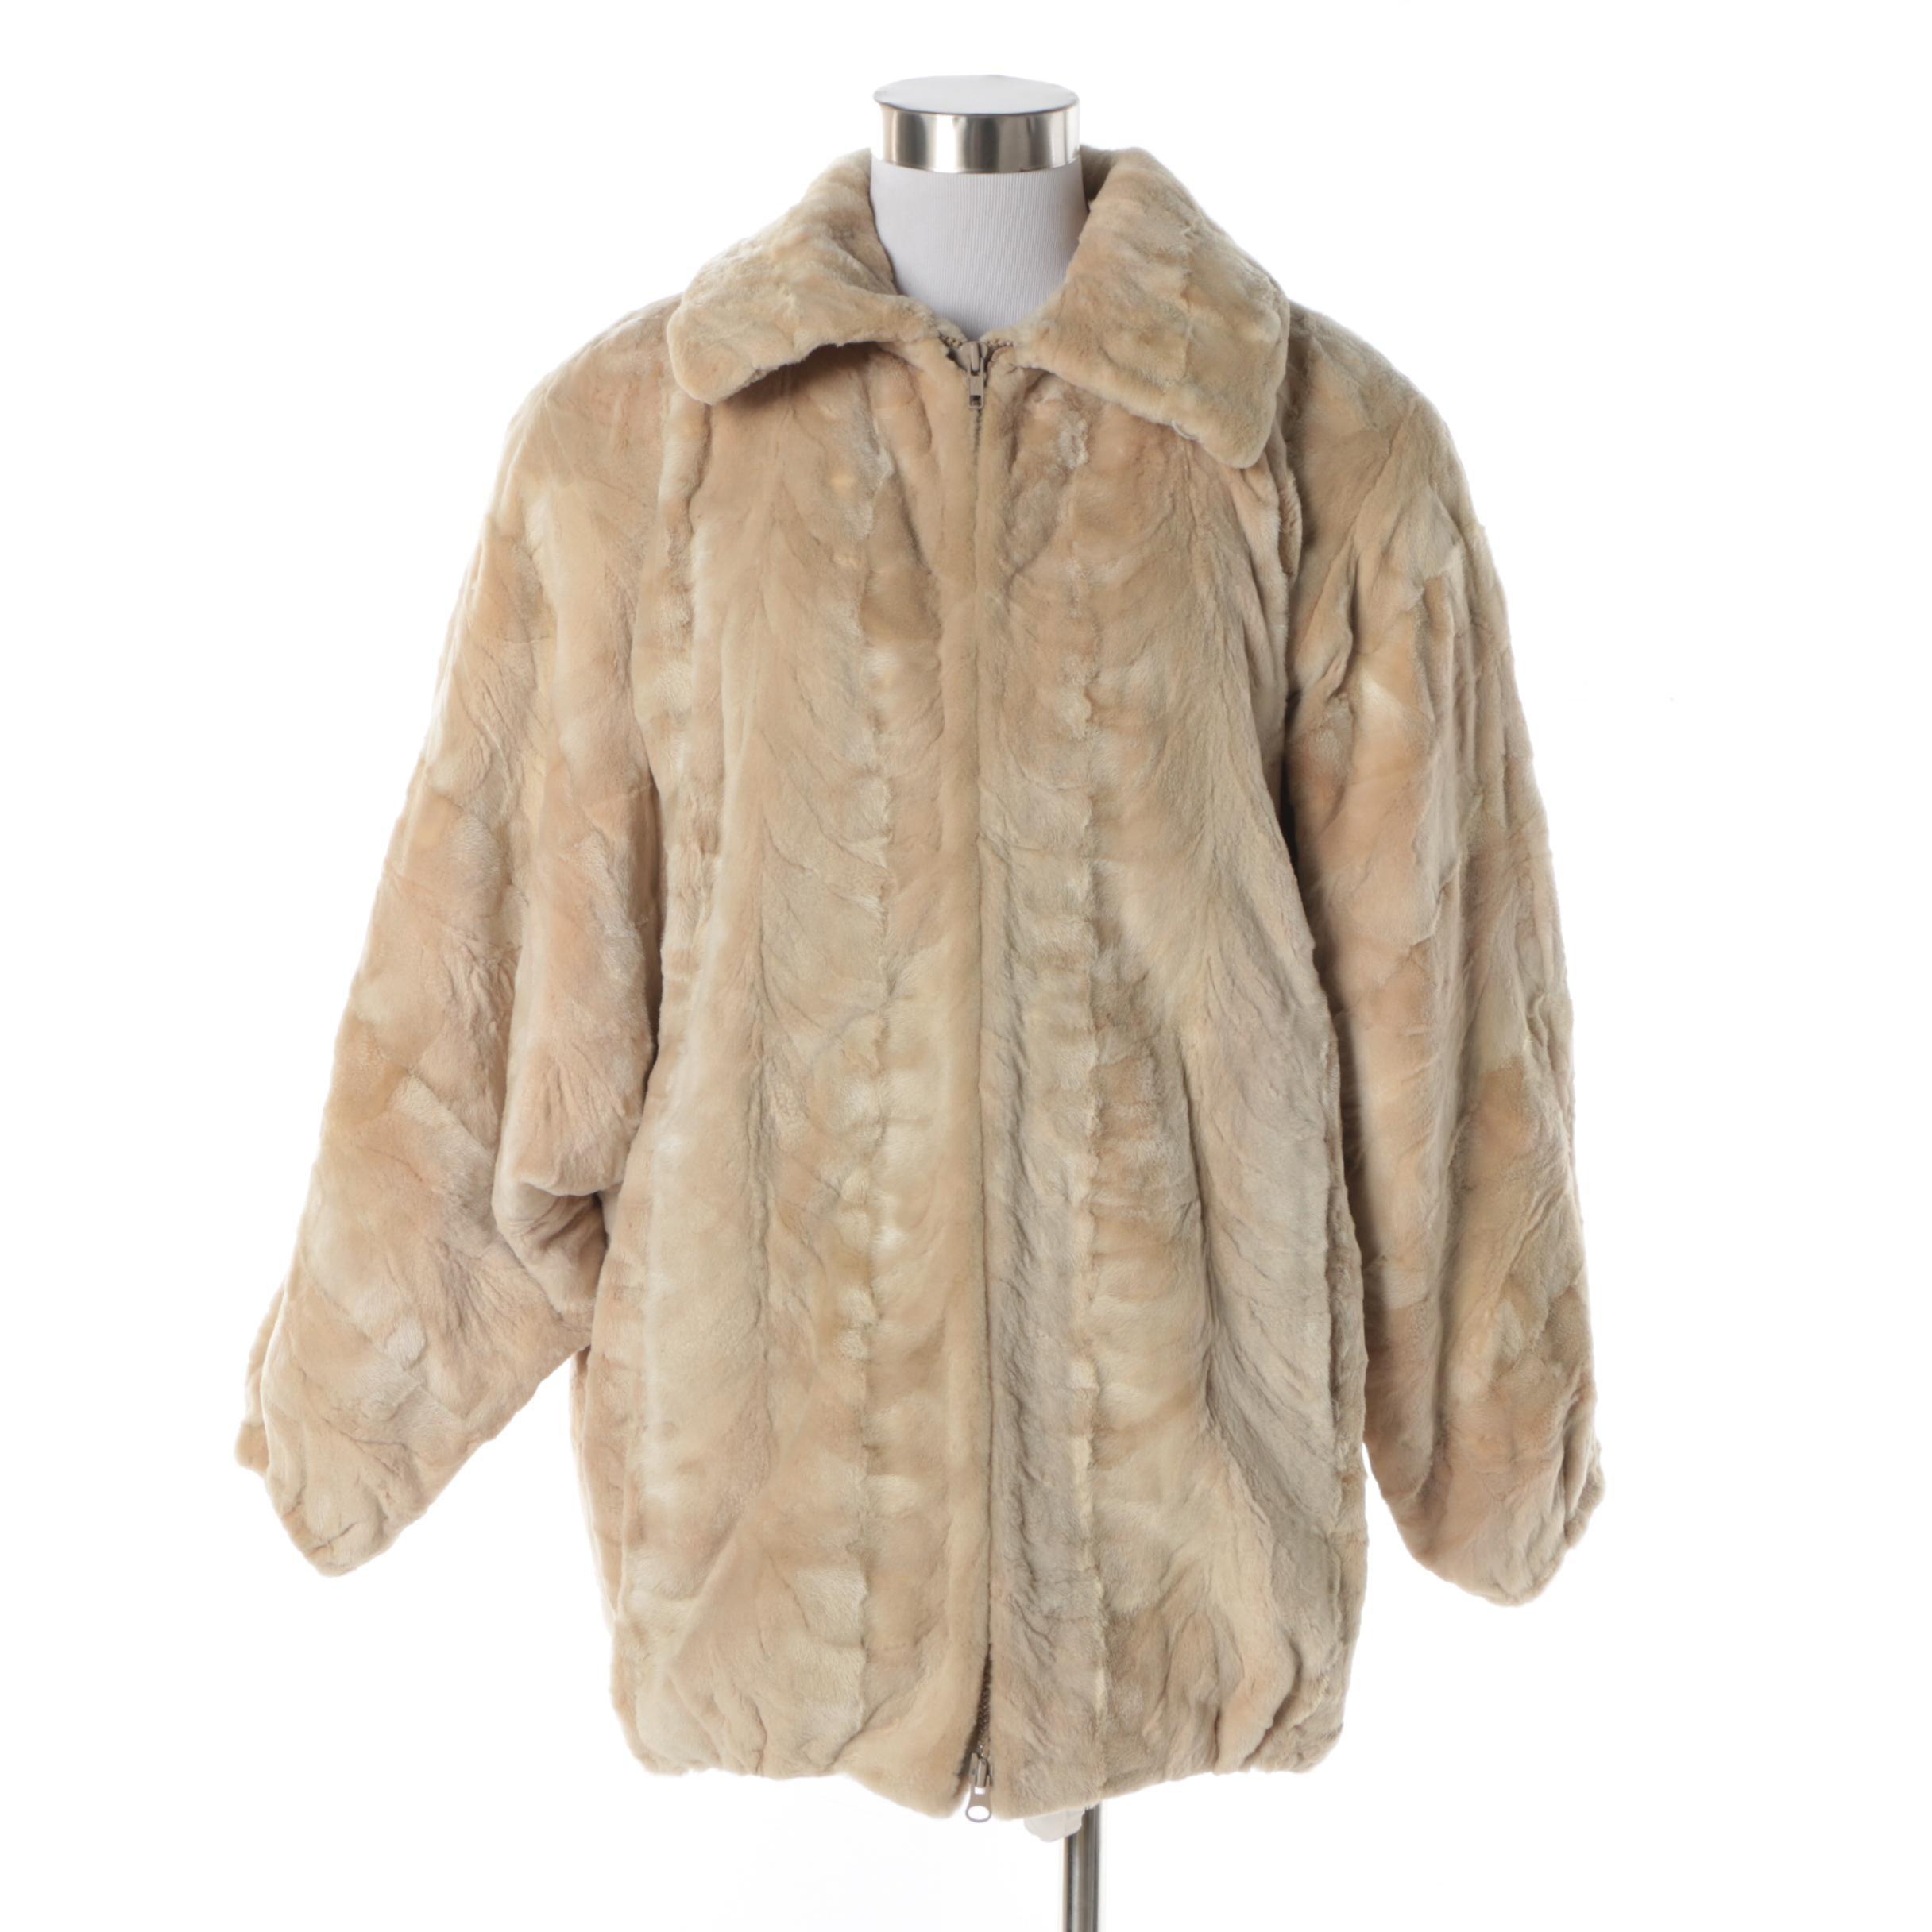 Women's Vinatge Leonard Furs Patchwork Sheared Bleached Beaver Fur Coat